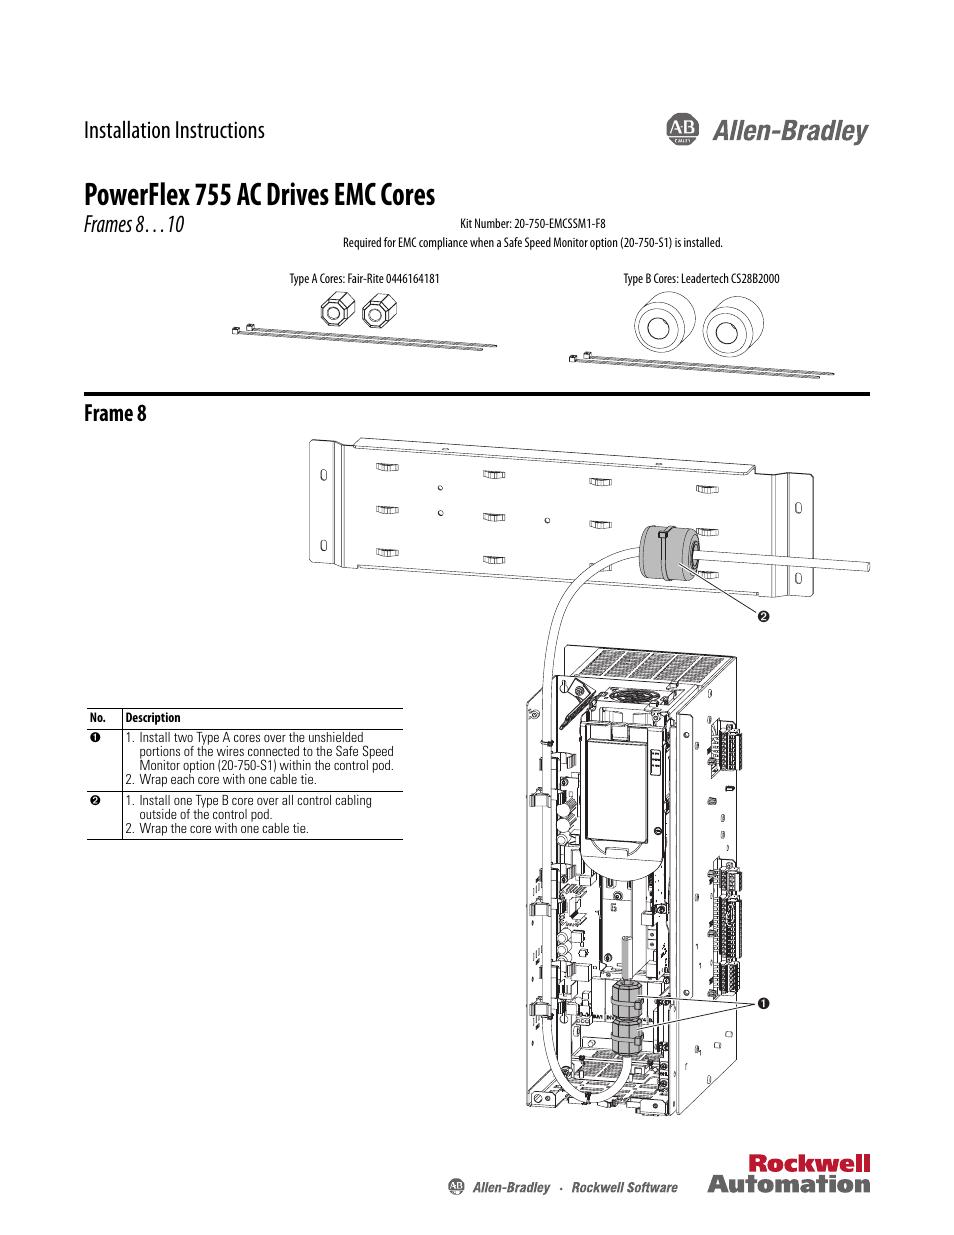 Powerflex 4 Vfd Connection Diagram - Wiring Diagrams Hidden on